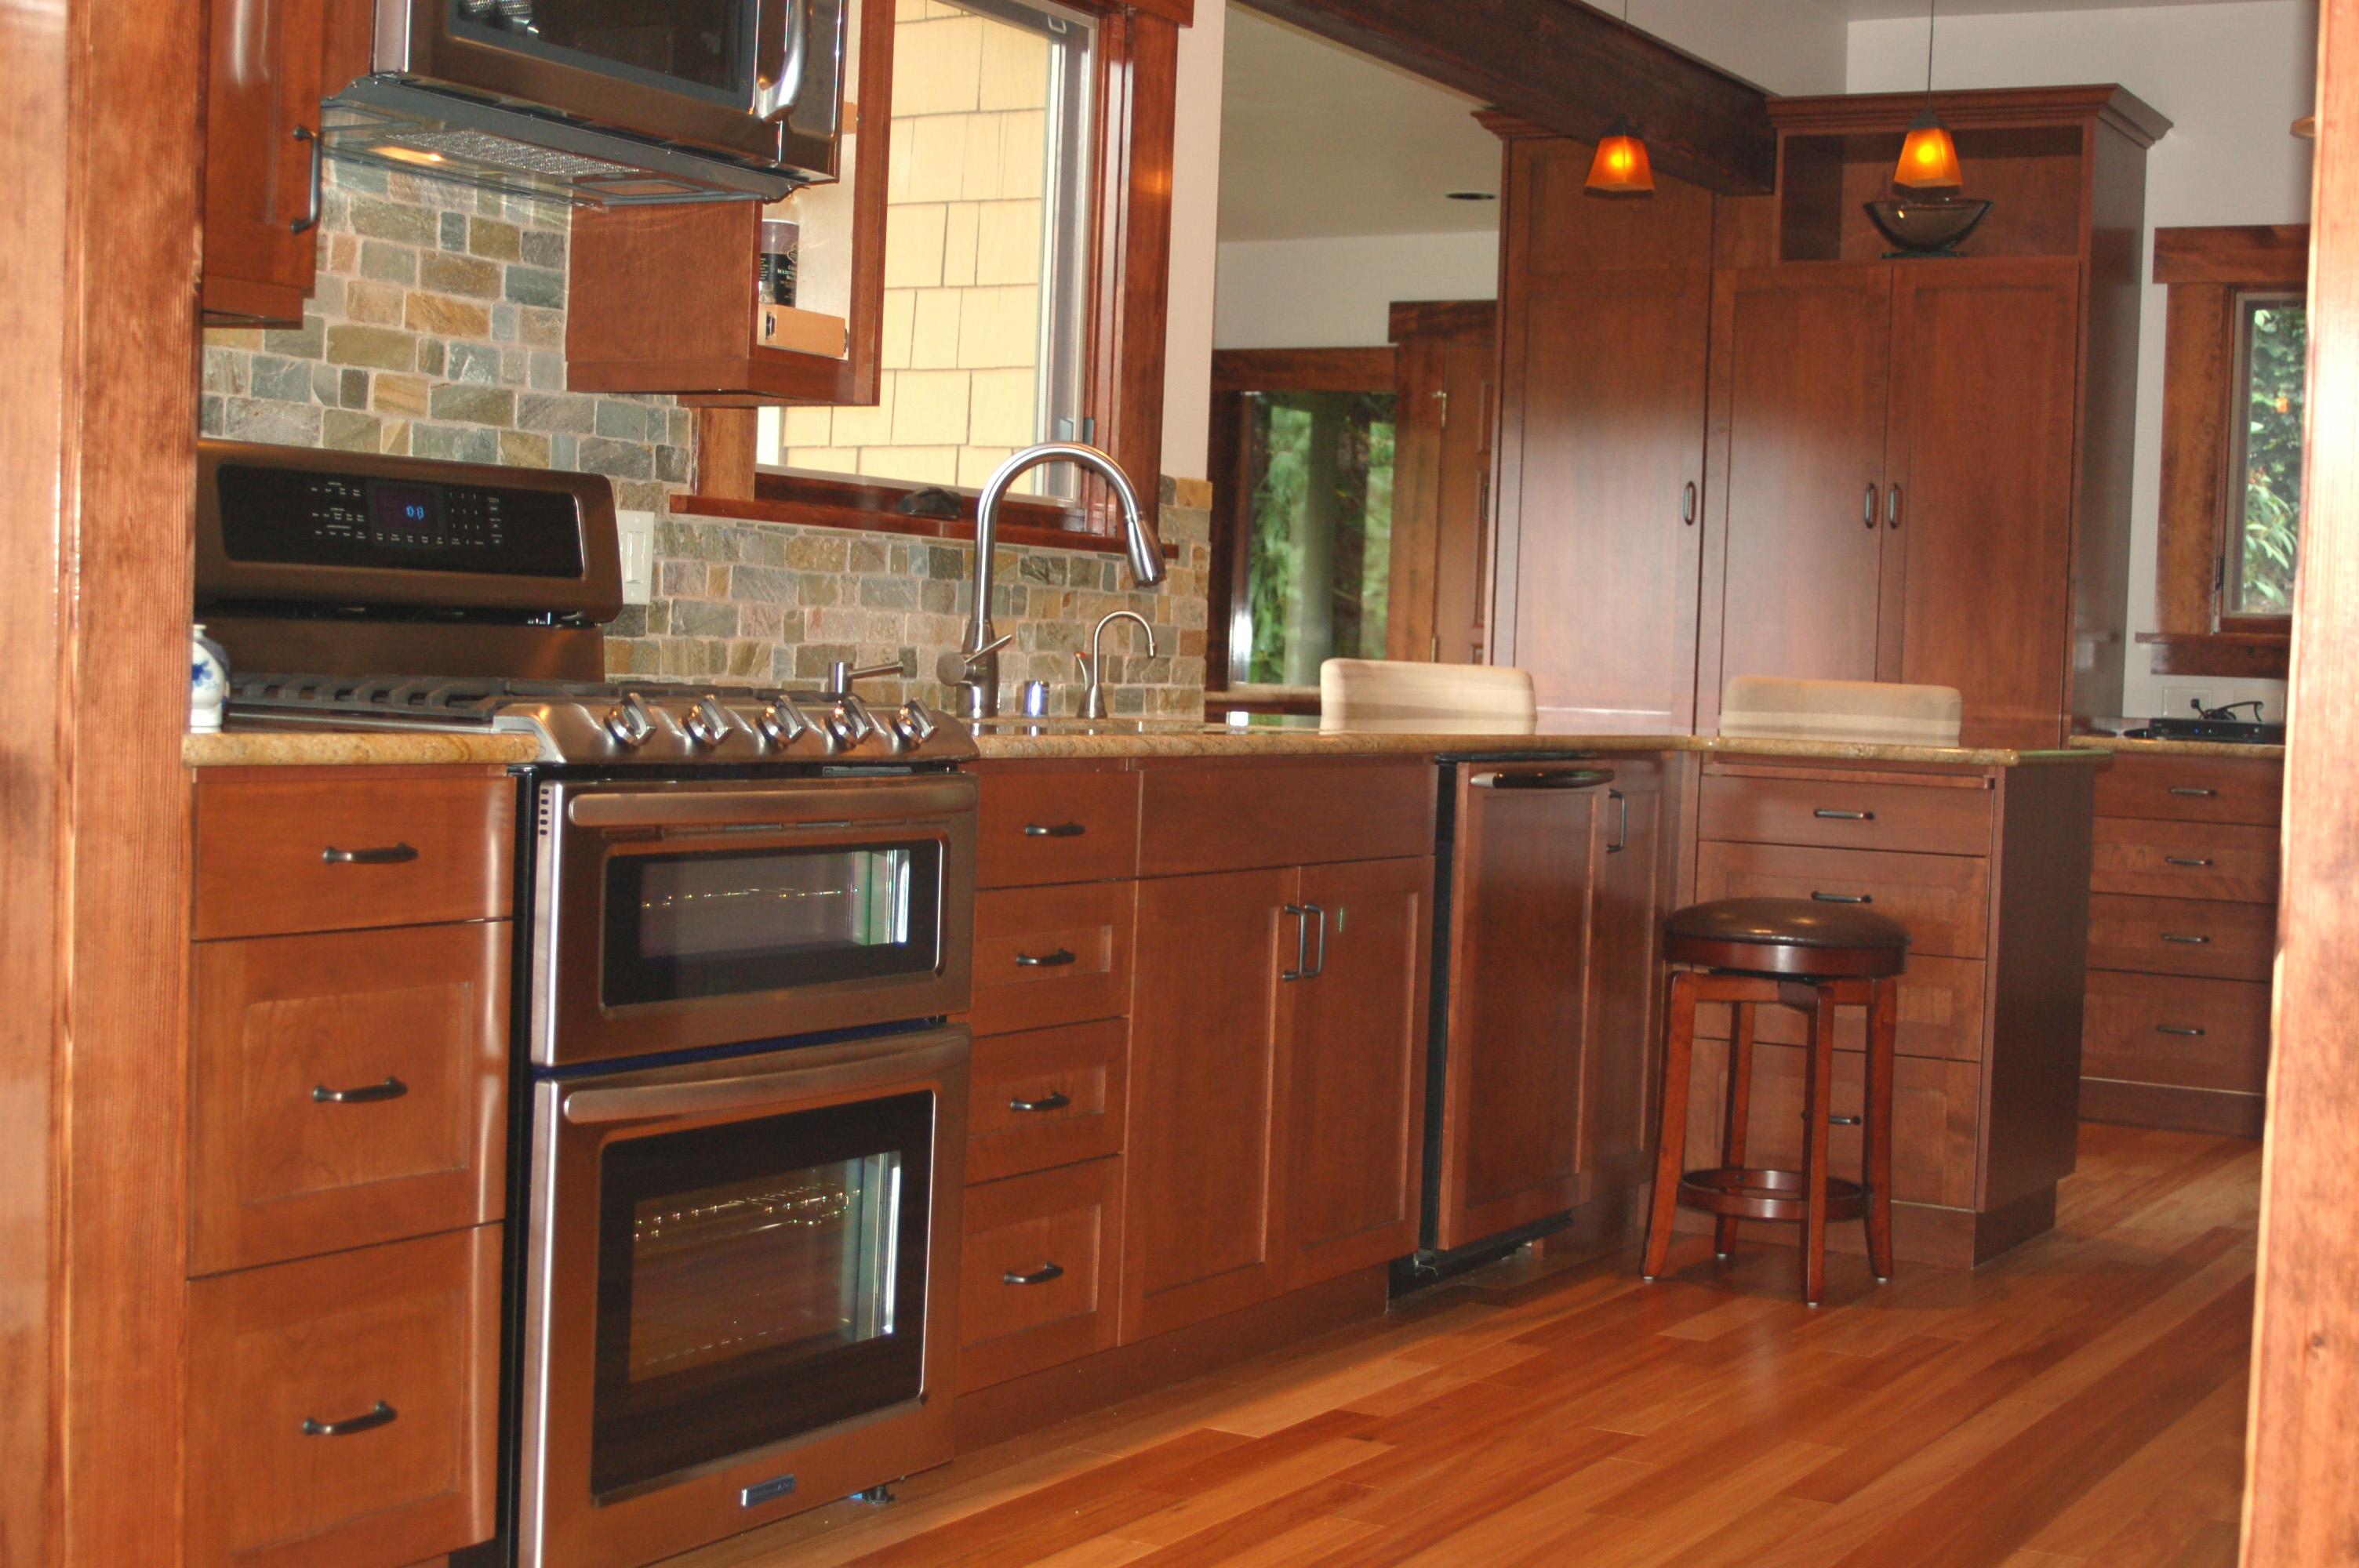 Kitchen Cabinets Home Depot Home Depot Kitchen Appliances Home - Quaker kitchen design